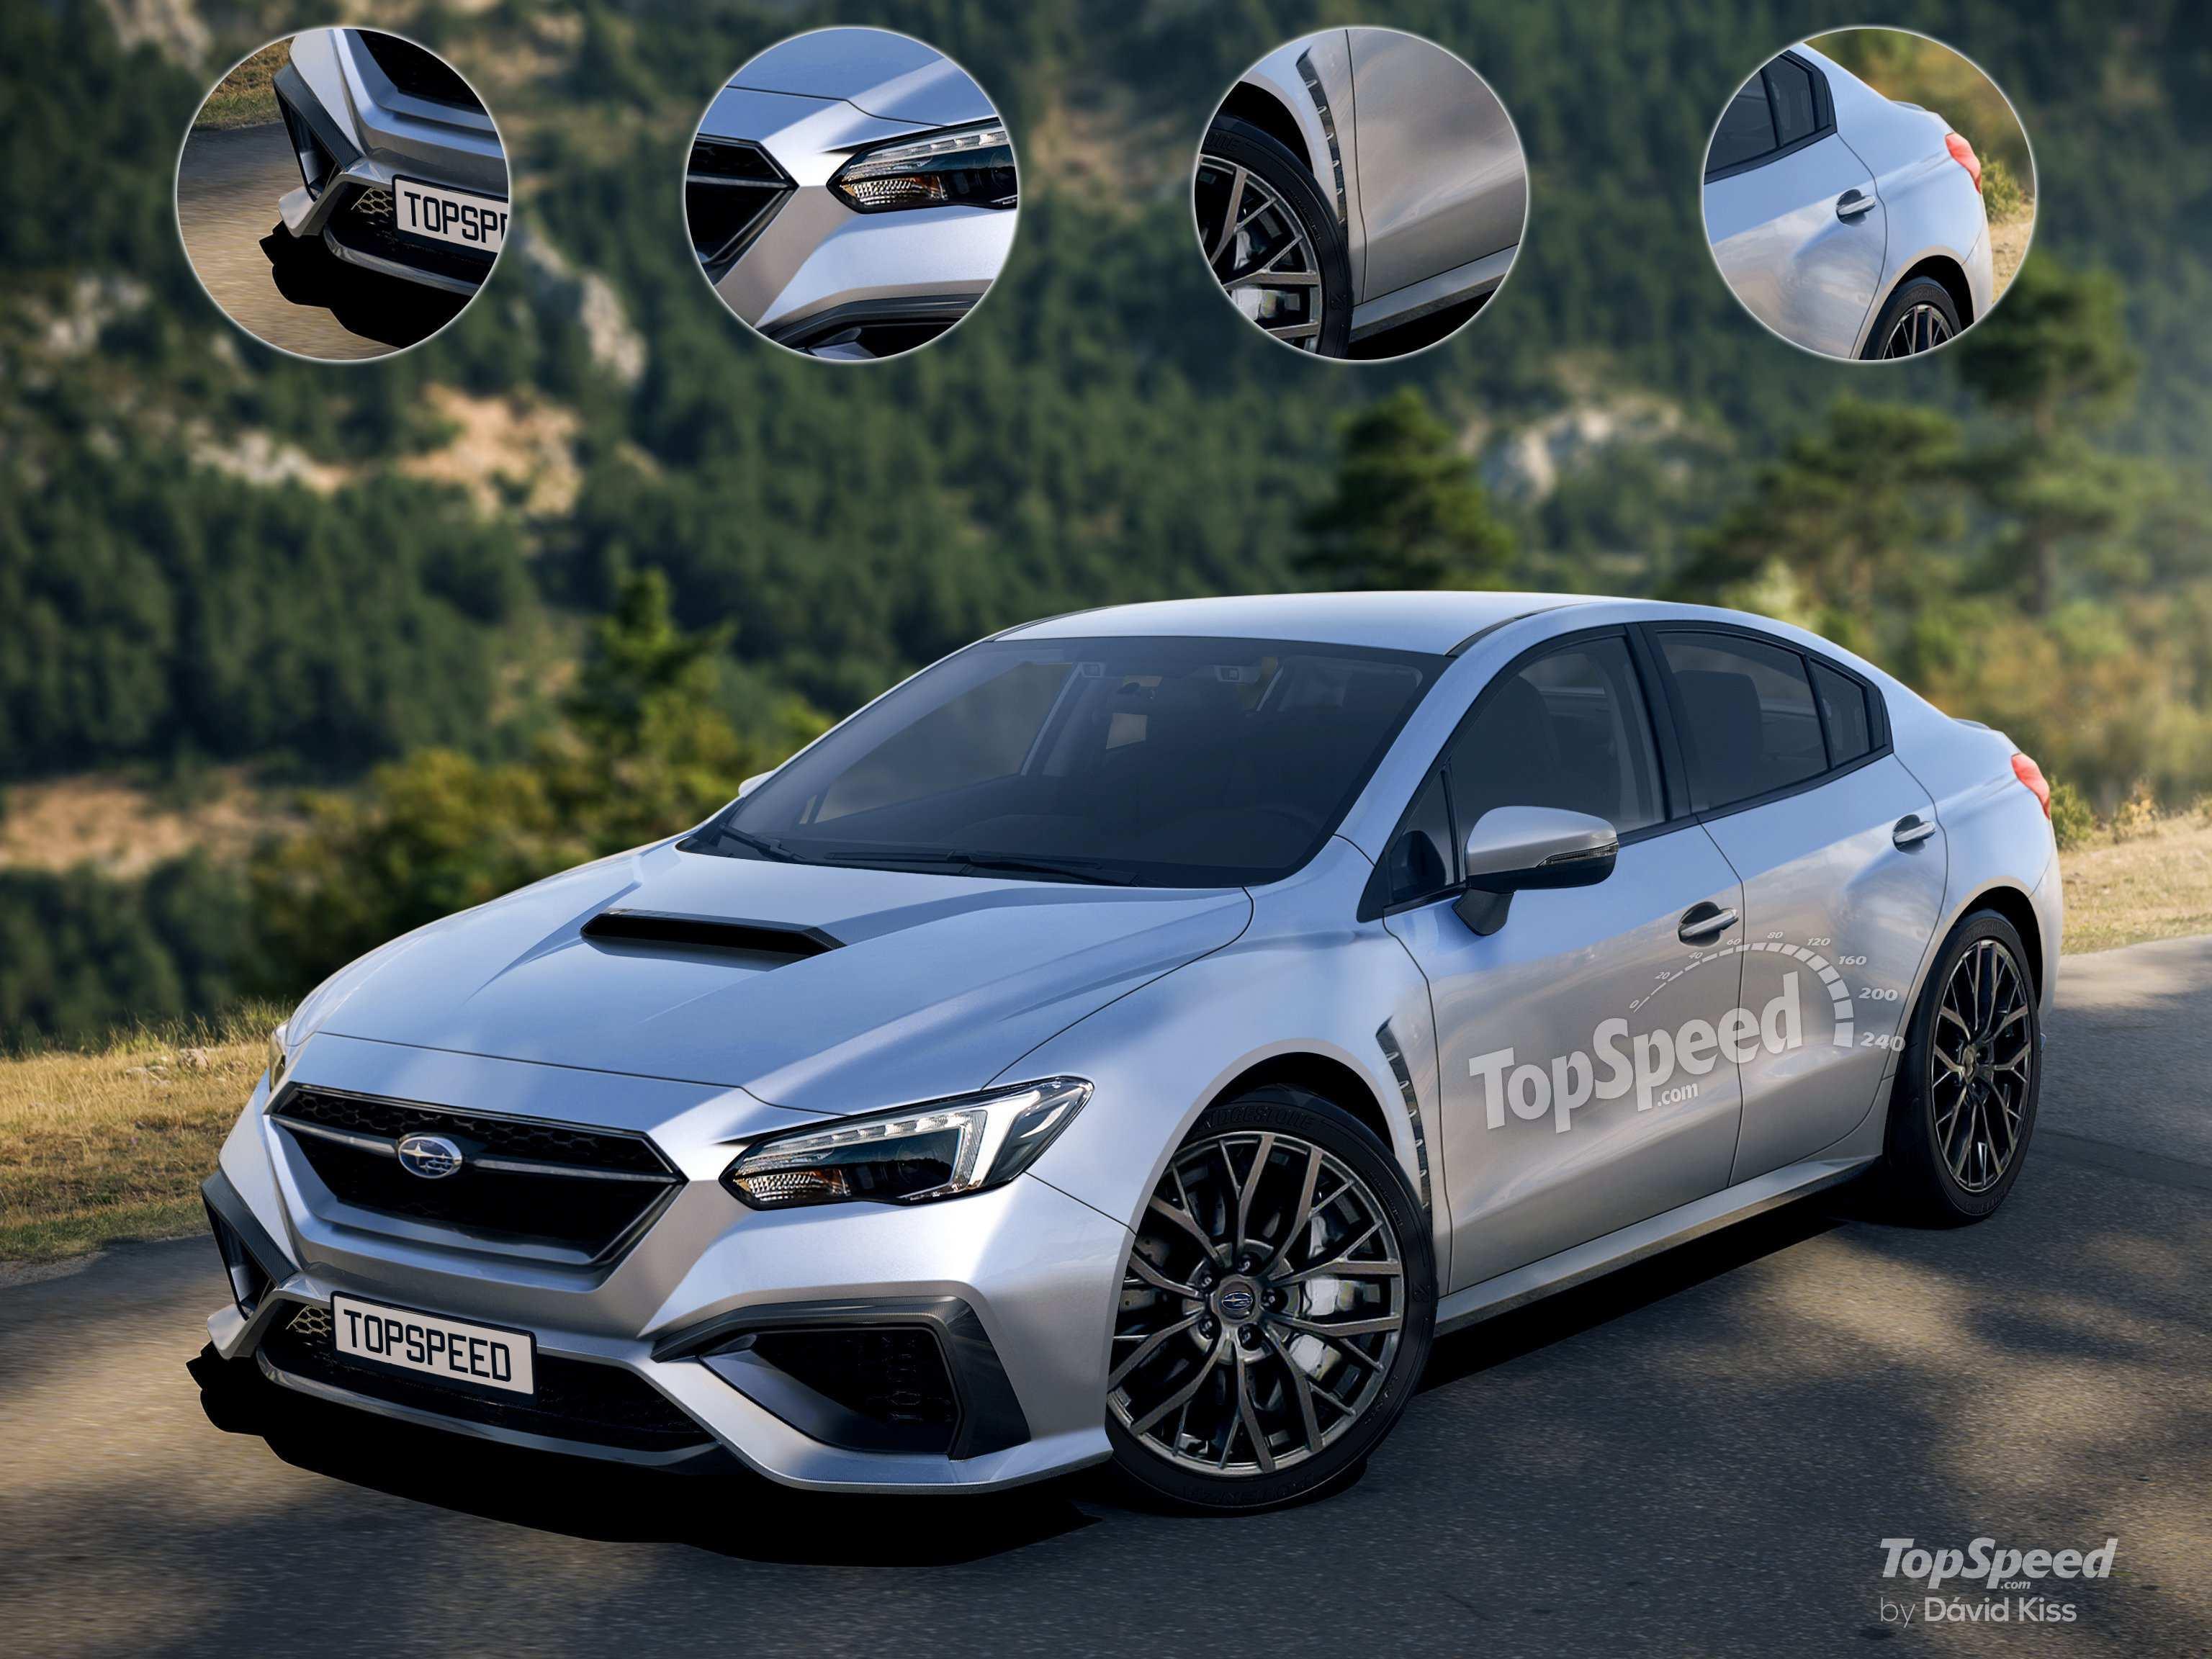 50 Gallery of Nuevo Subaru 2020 Style with Nuevo Subaru 2020